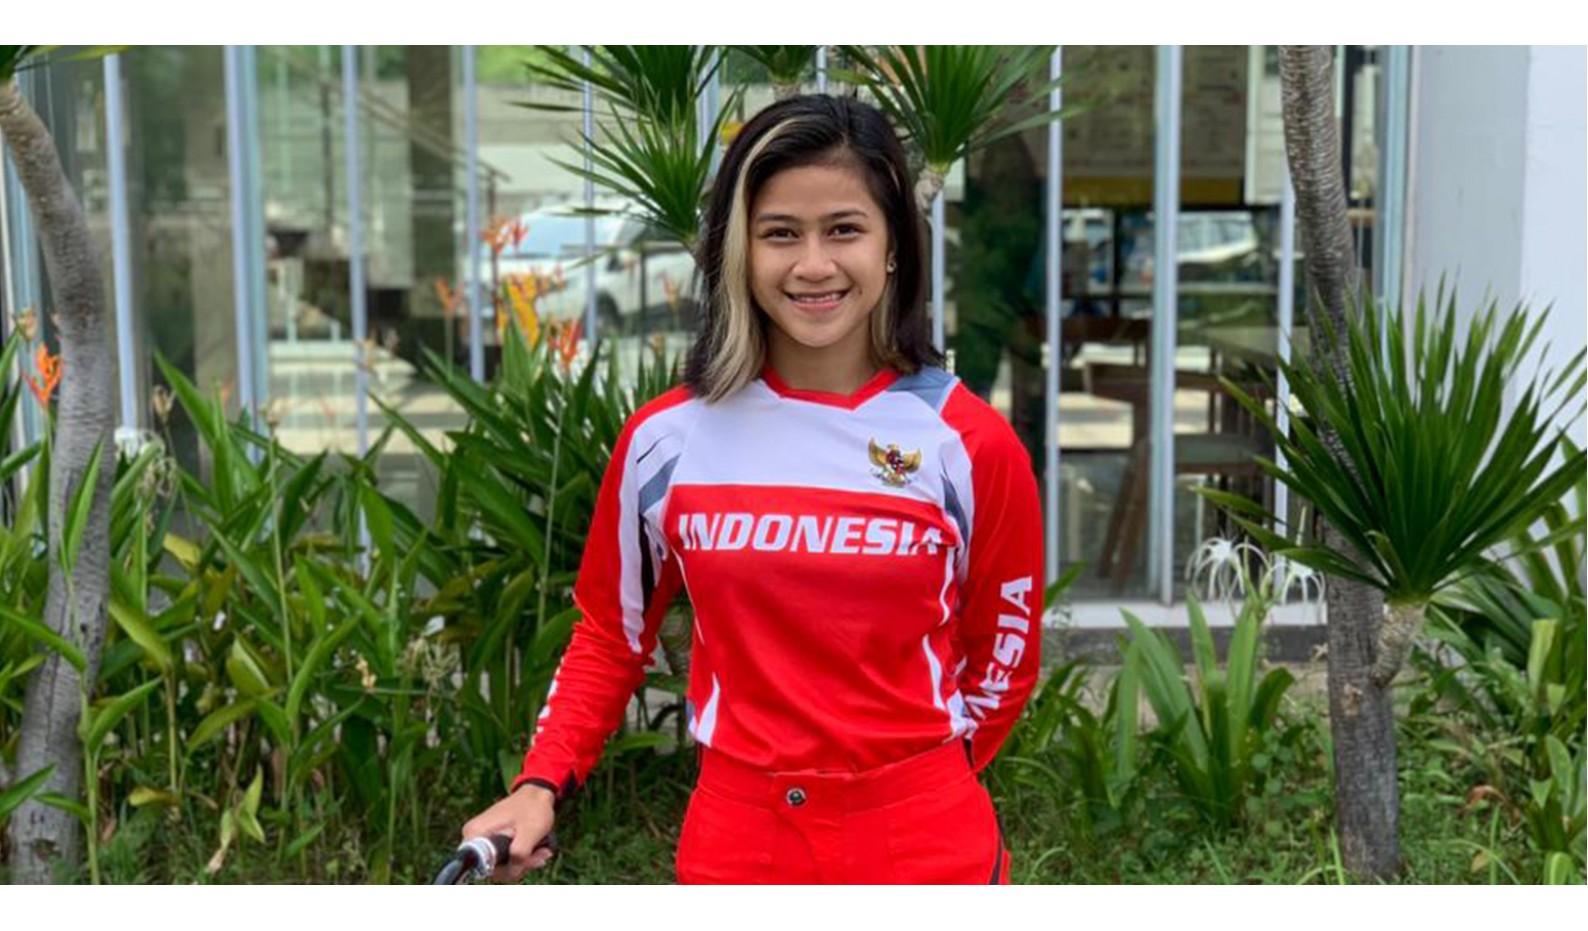 Jasmine Azzahra Akan Berlaga di 2021 UCI BMX World Championship